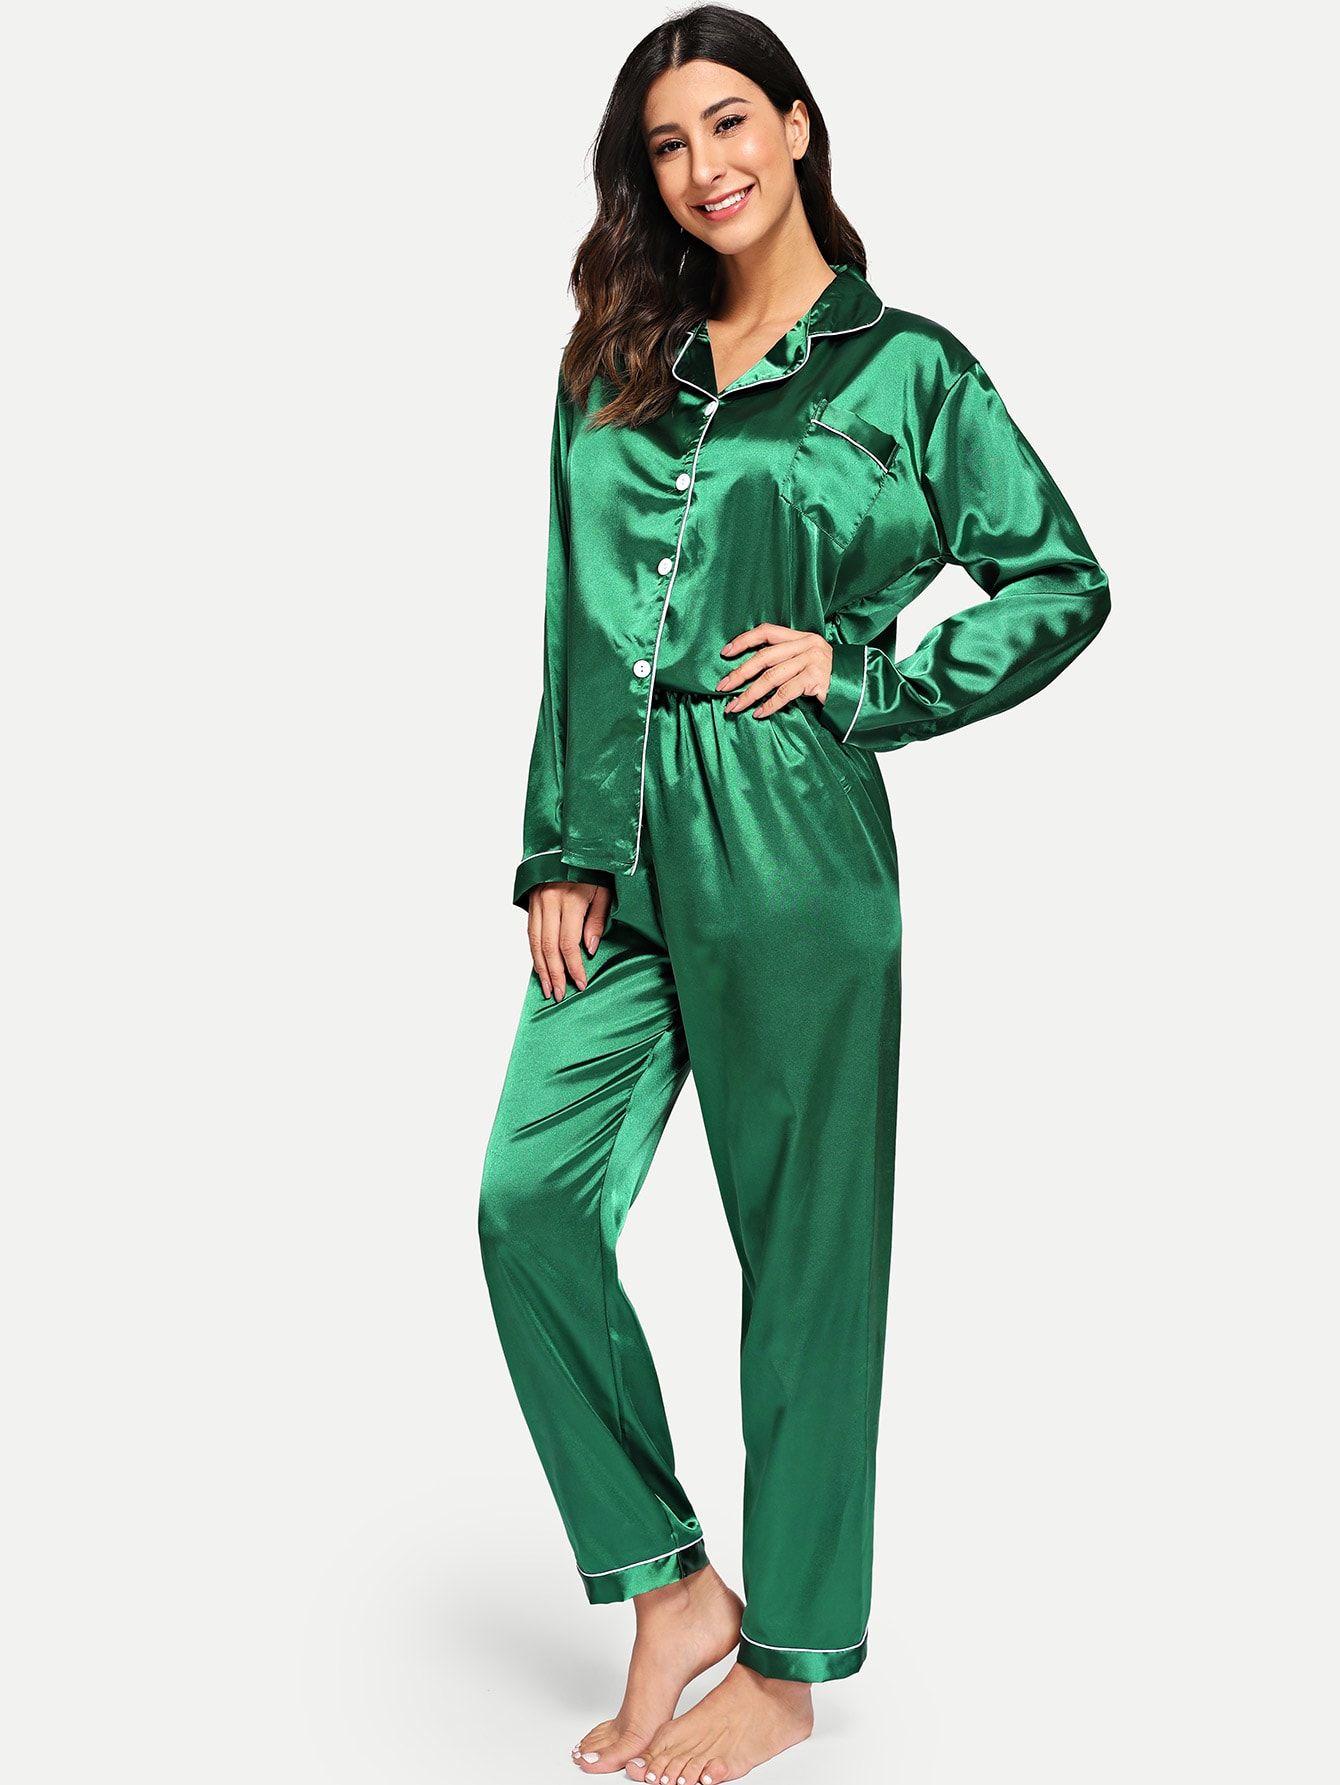 dd623ef81e Contrast Binding Button Up Satin Pajama Set Button Binding Contrast ...